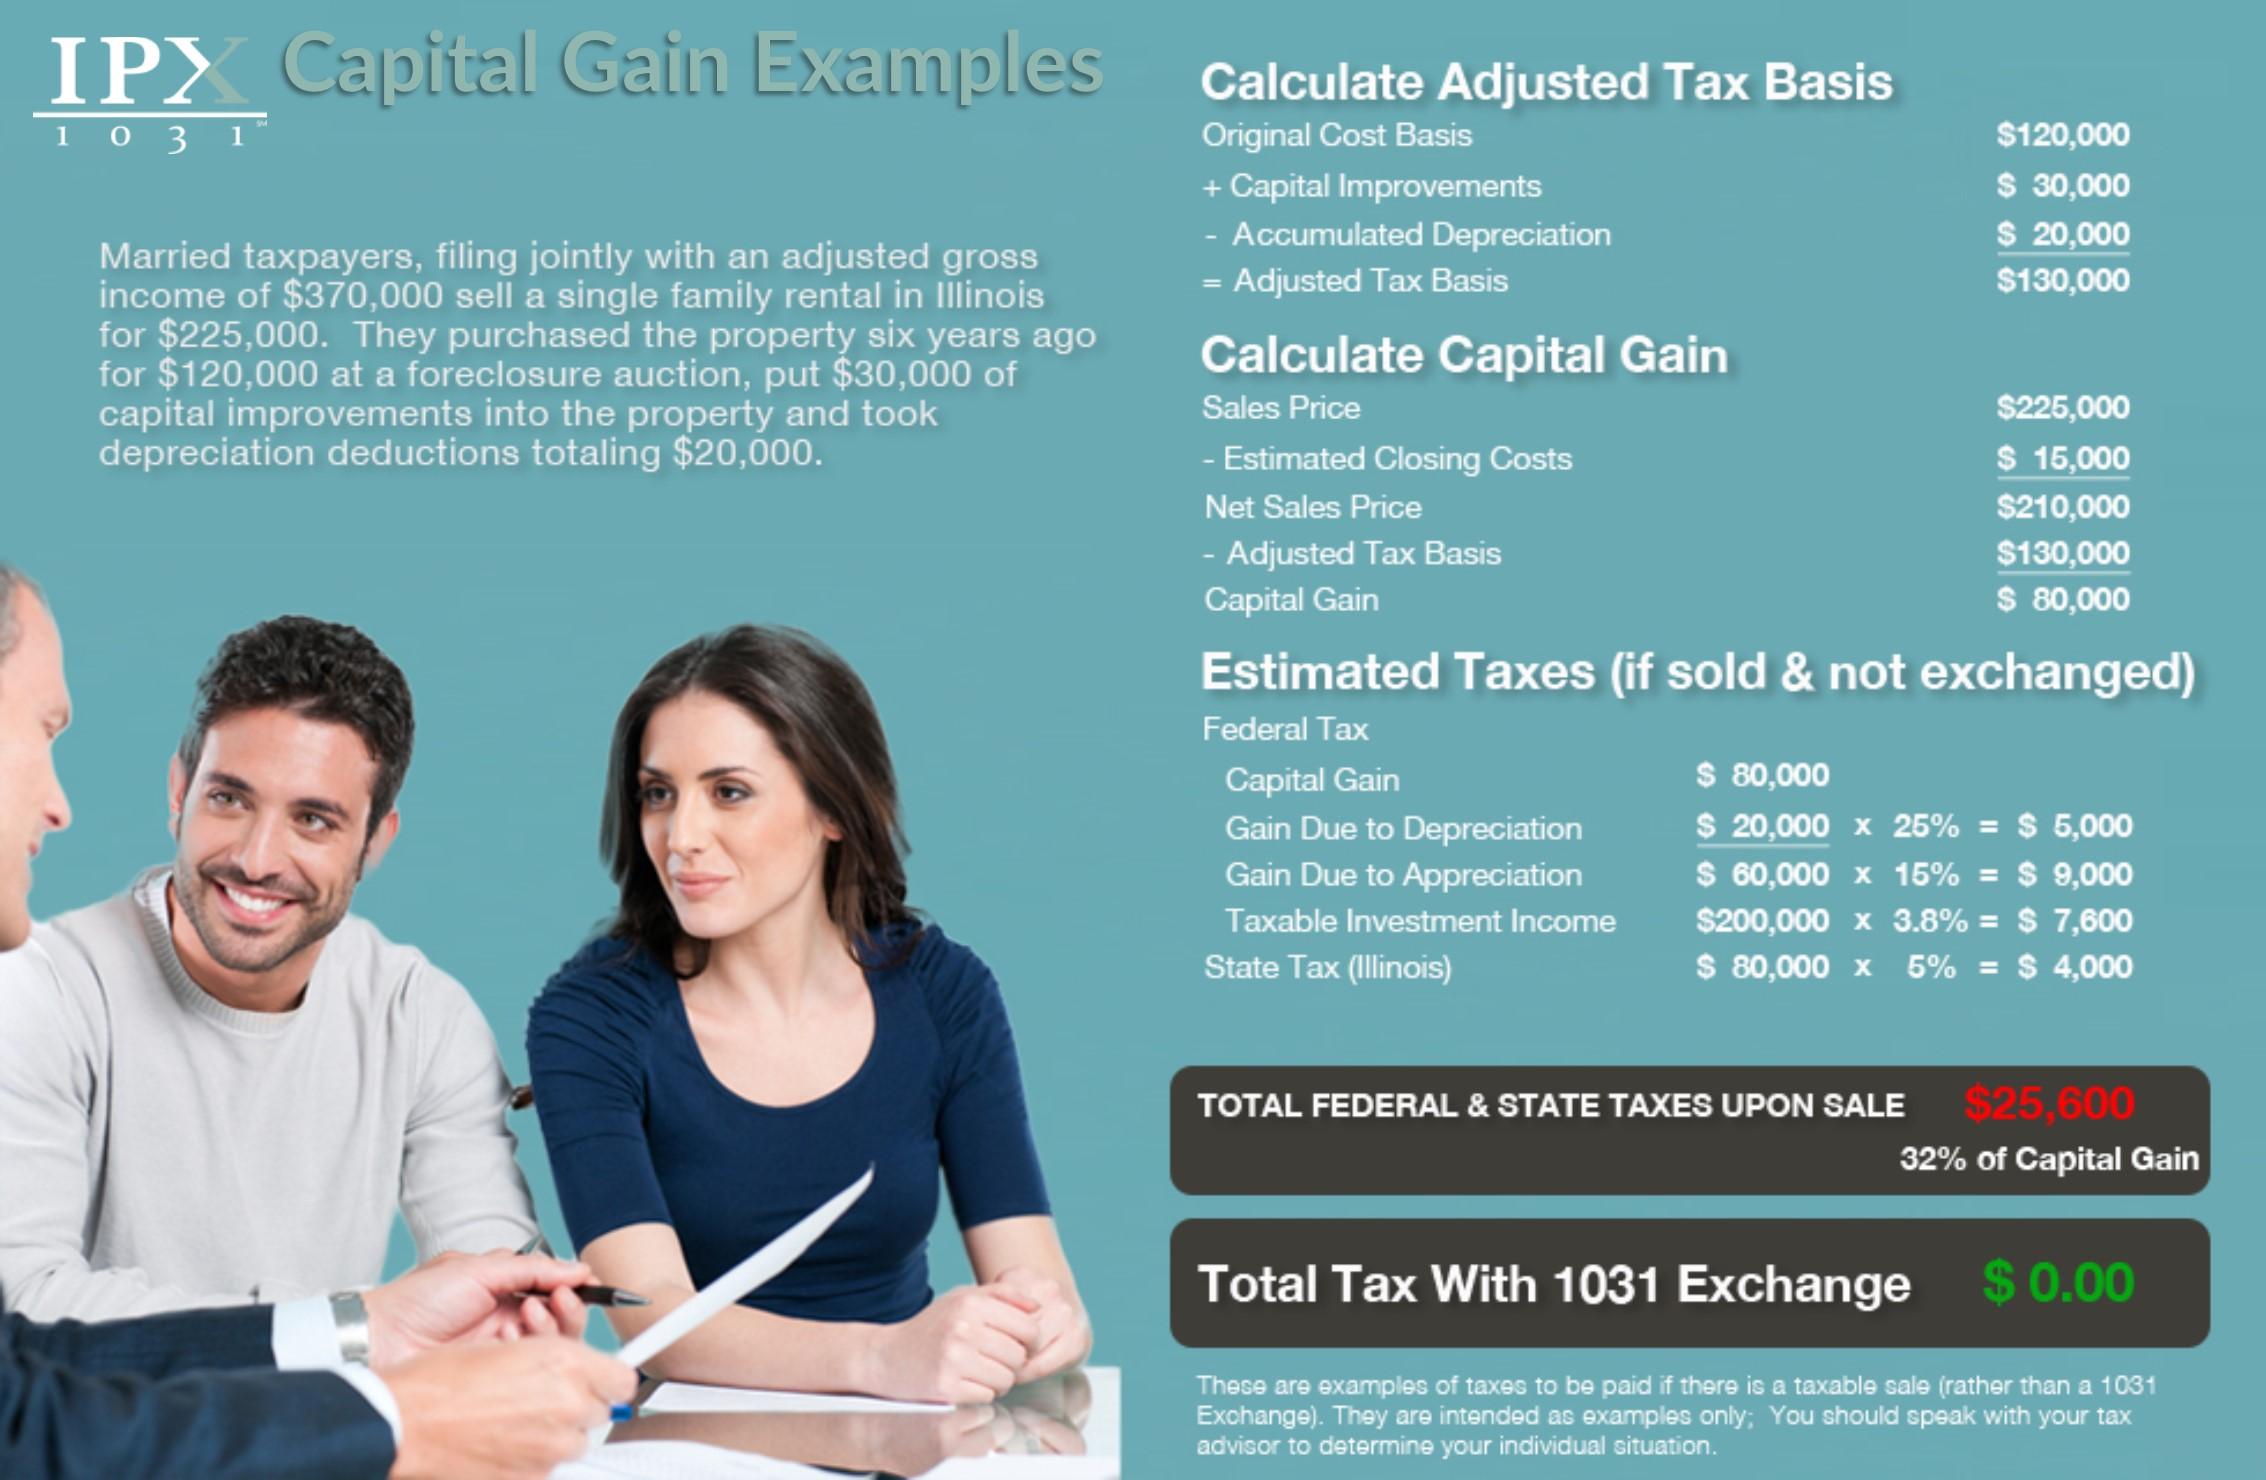 1031 exchange tax calculator